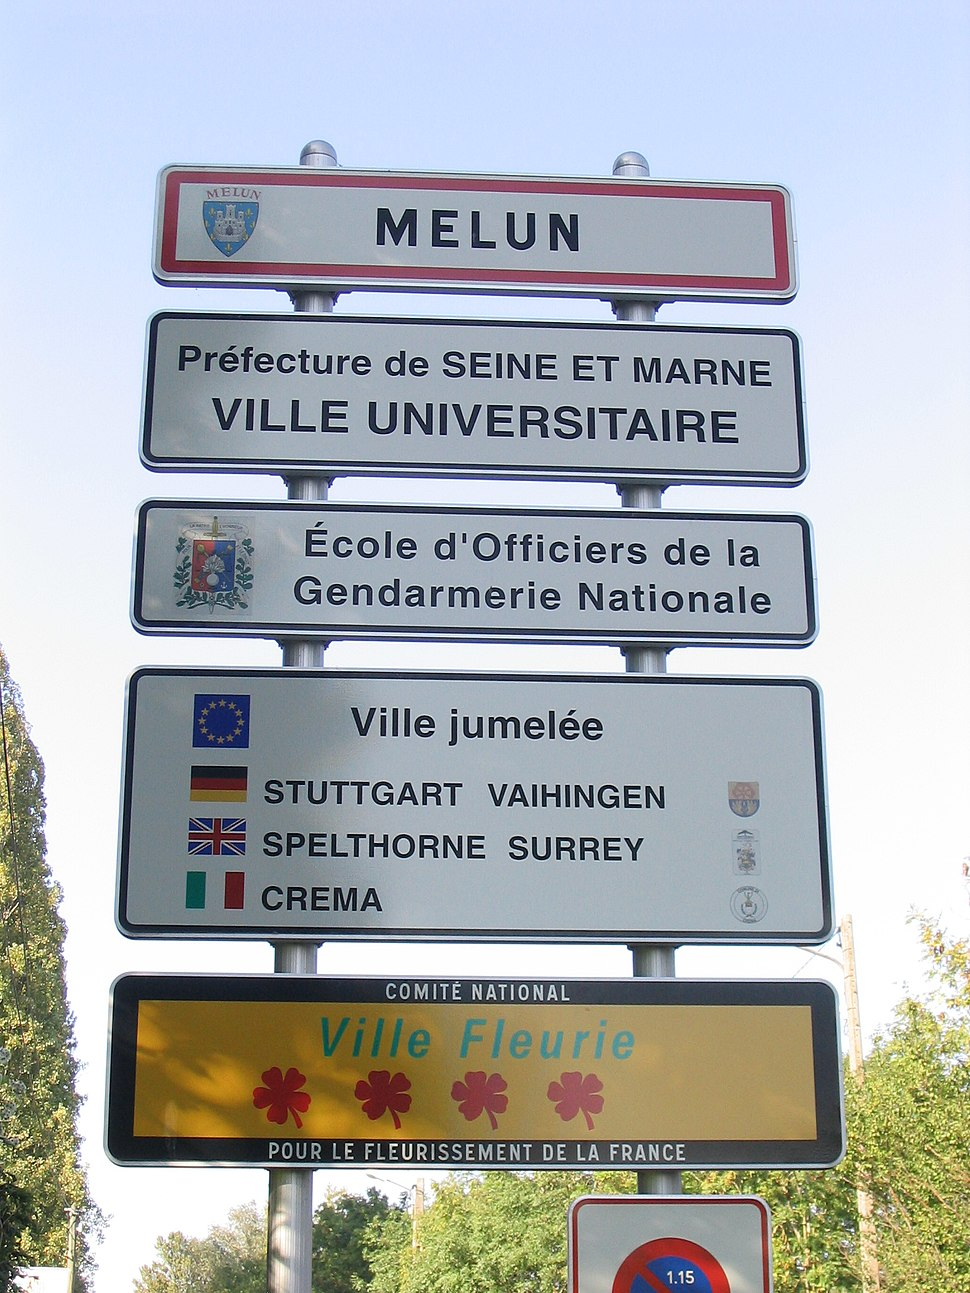 PANNEAU ENTREE MELUN